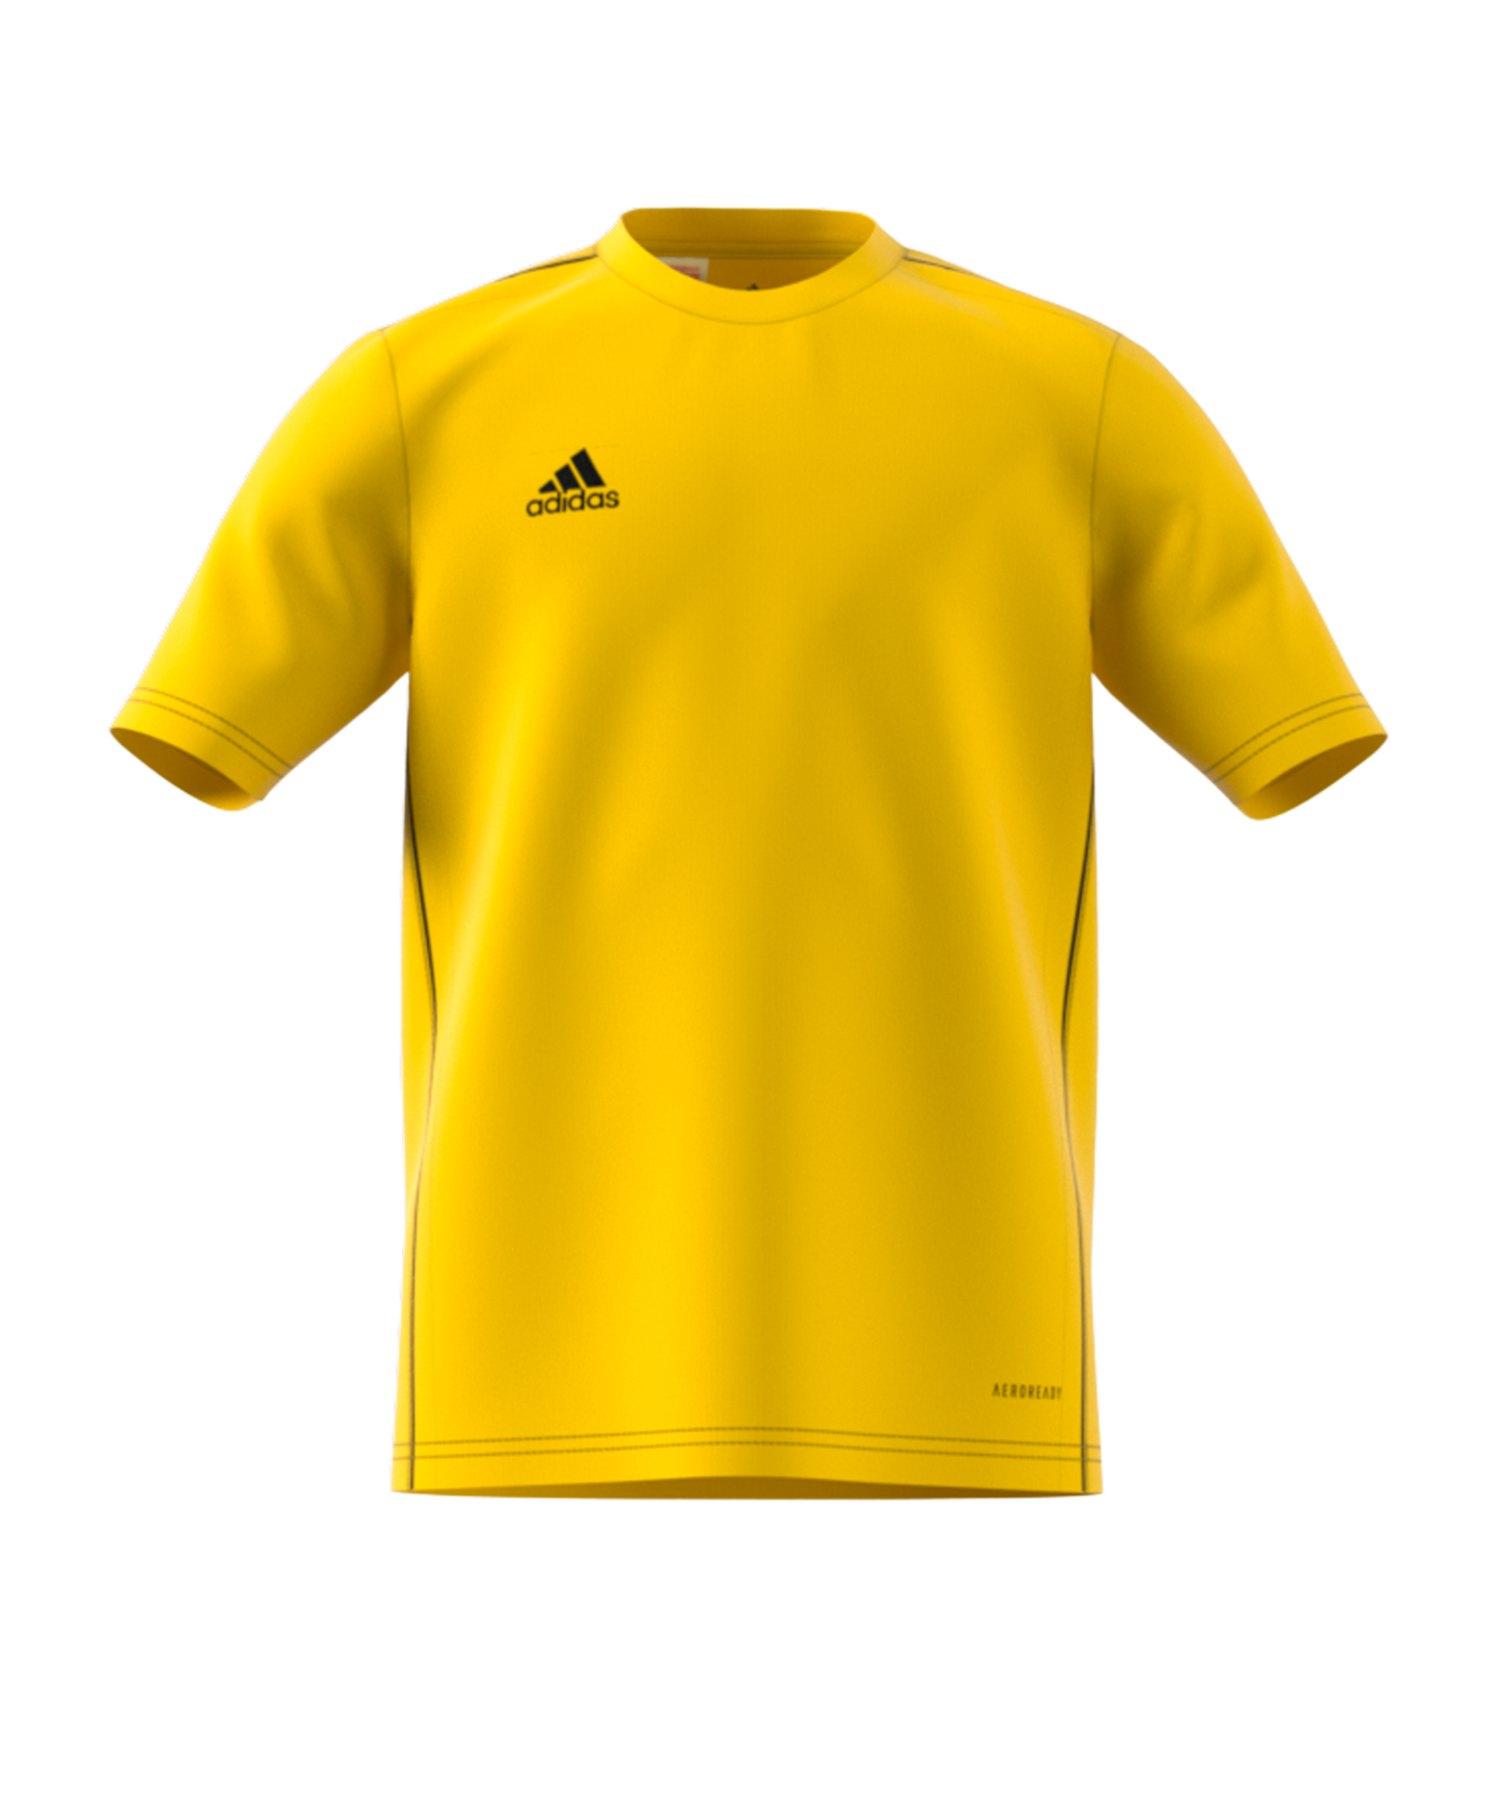 adidas Core 18 Tee T-Shirt Kids Gelb - gelb